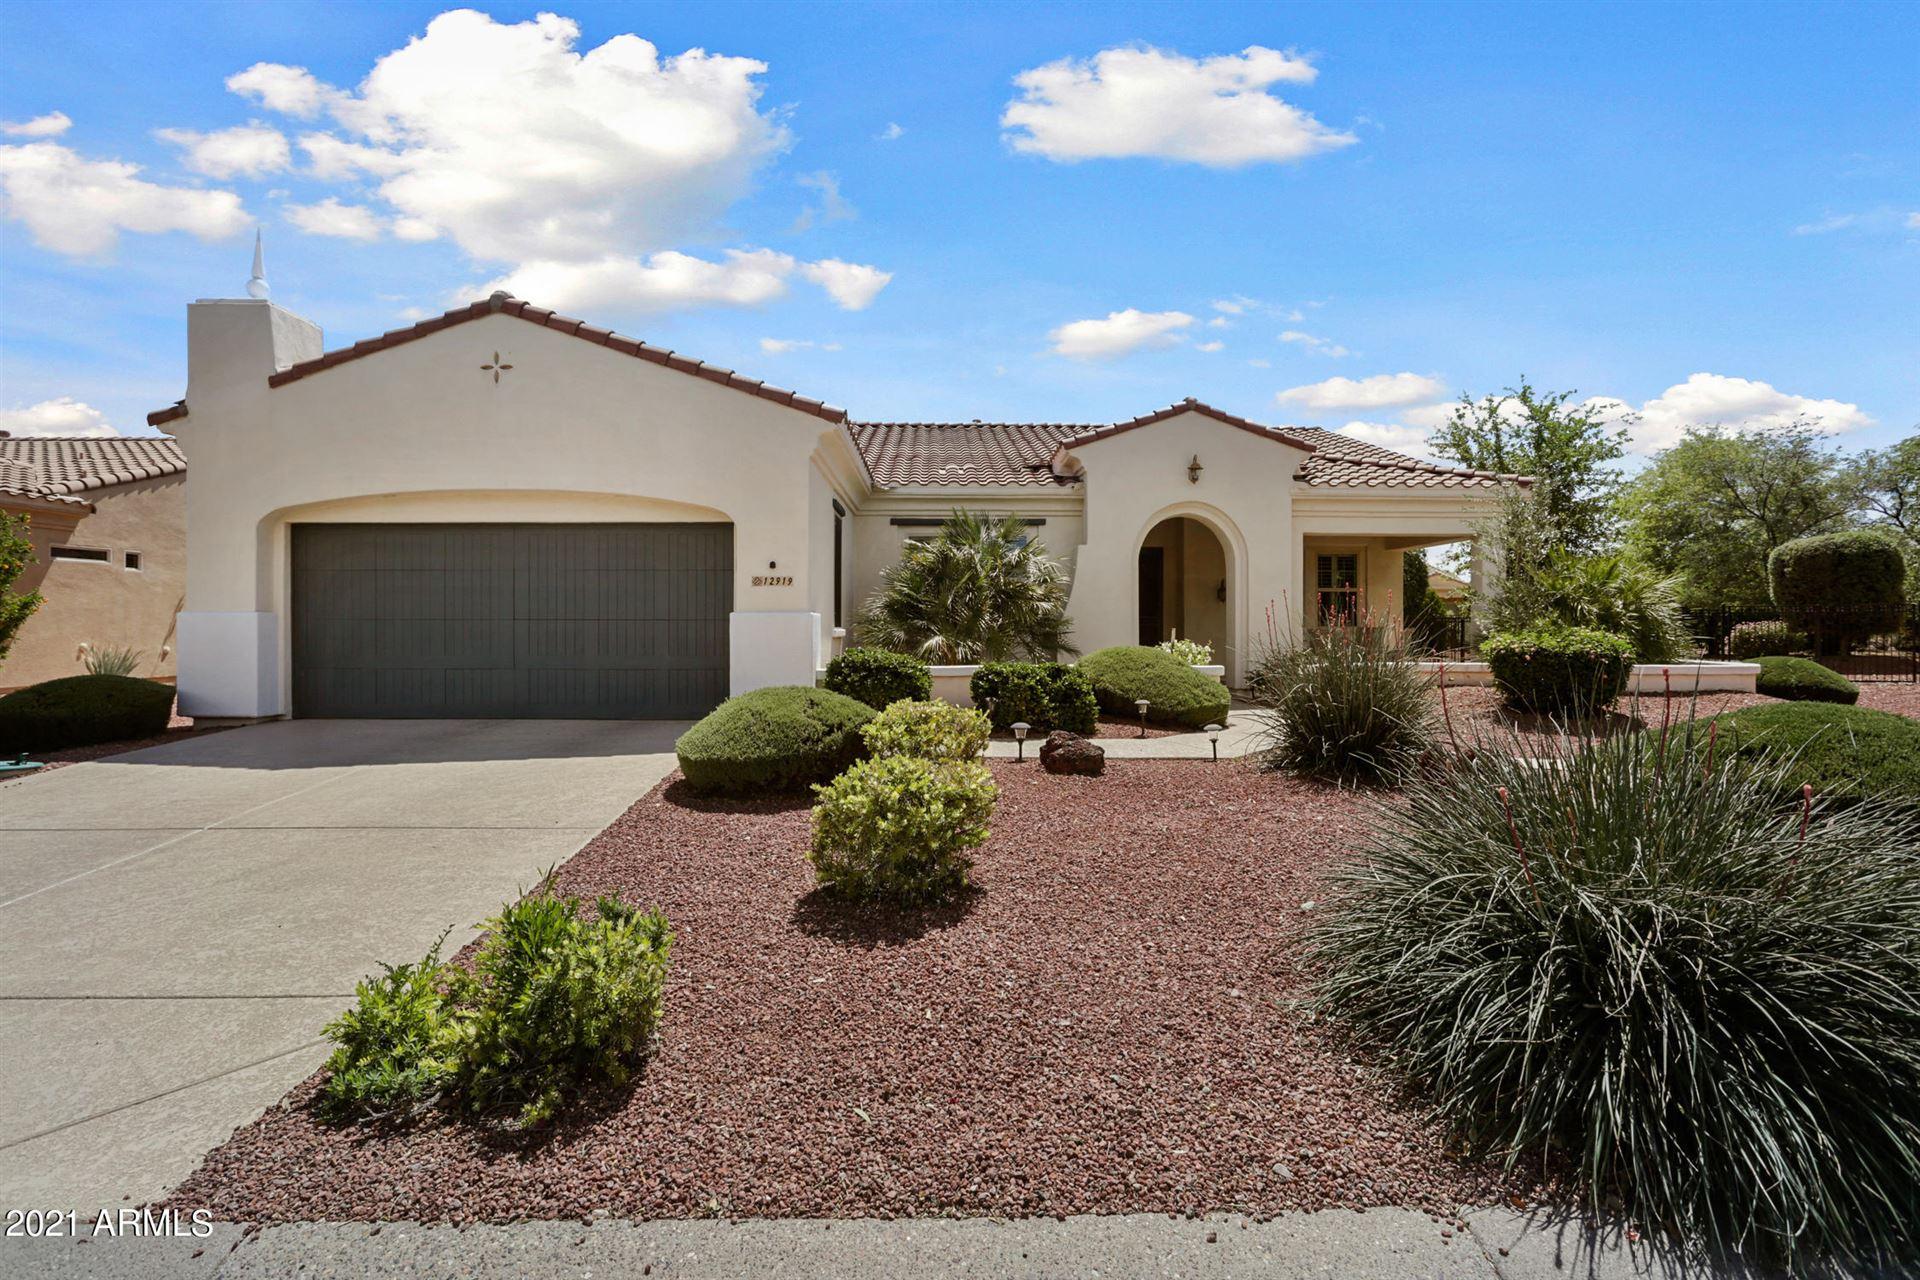 Photo of 12919 W Los Bancos Drive, Sun City West, AZ 85375 (MLS # 6220796)